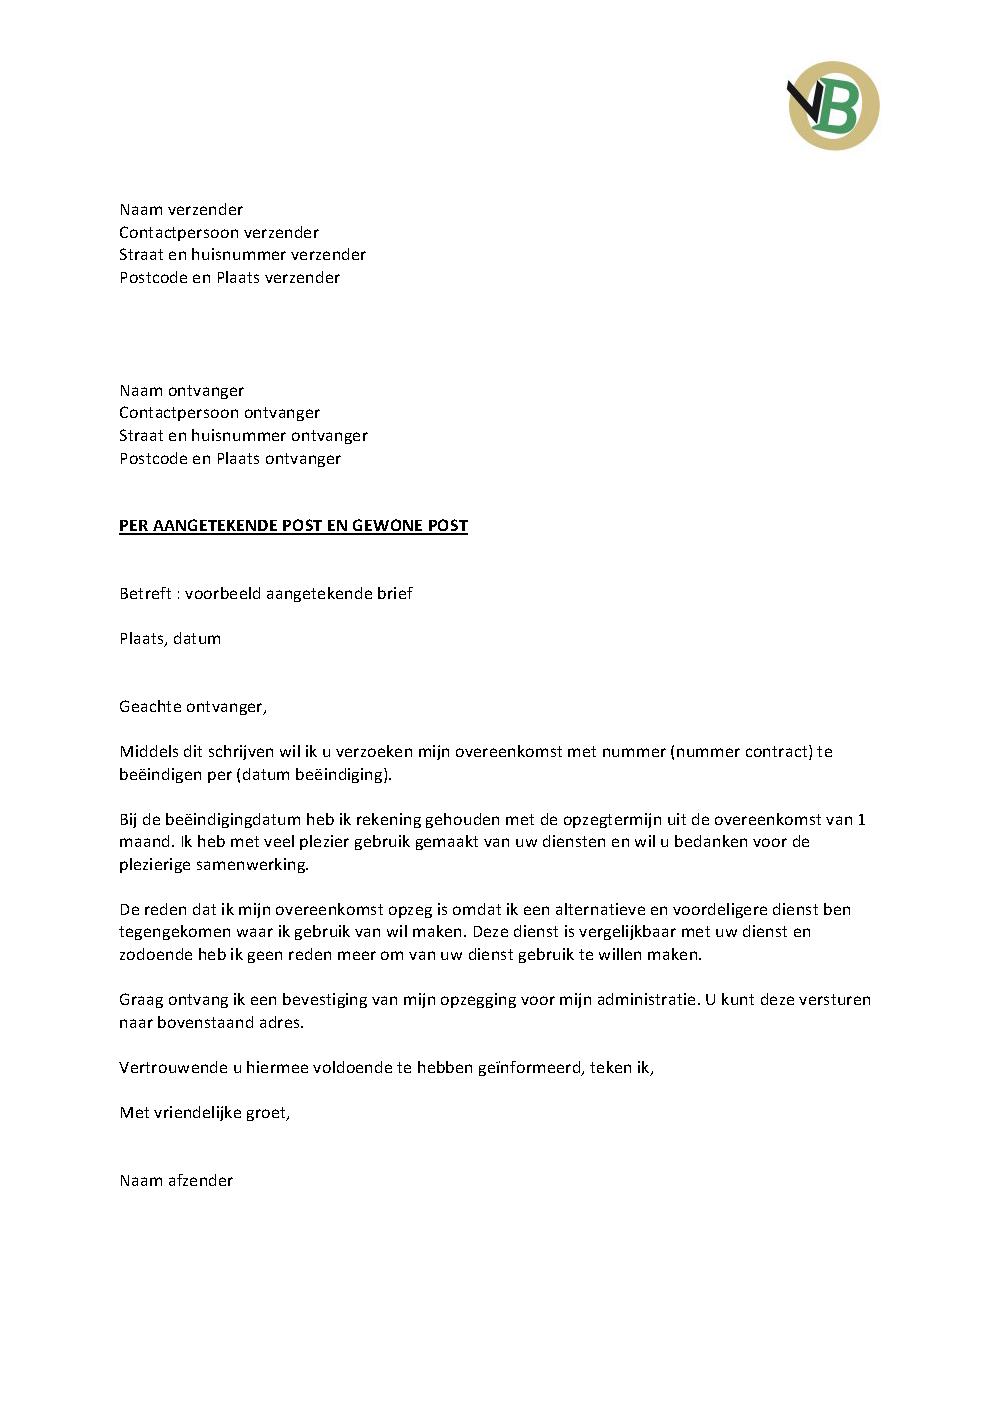 aangetekende ontslagbrief Voorbeeld Brief Opstellen | gantinova